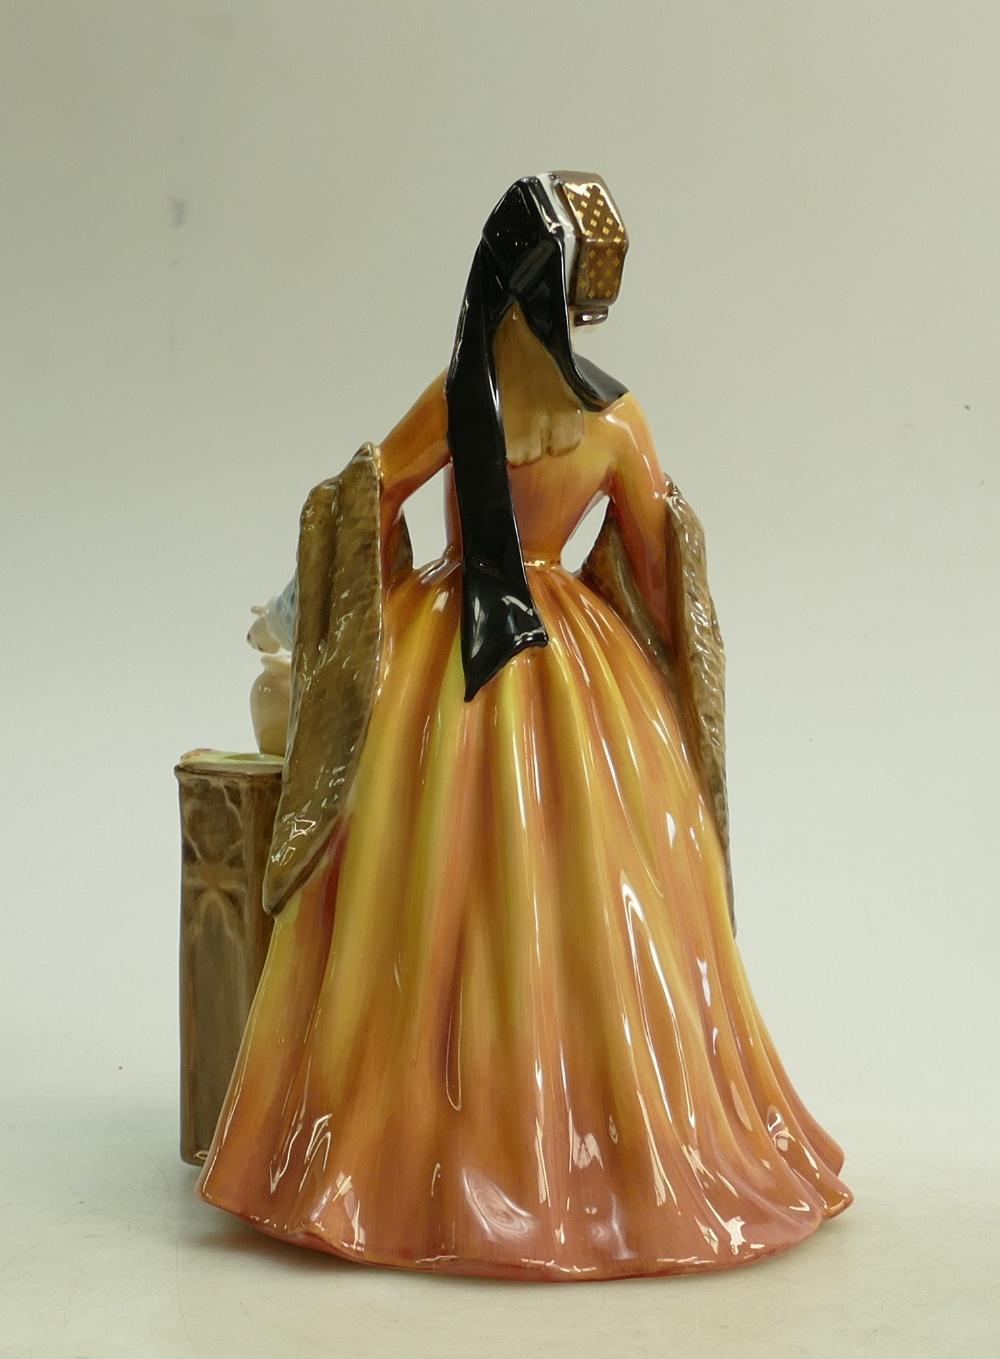 Lot 51 - Royal Doulton figure Anne Seymour HN3349: Limited edition.